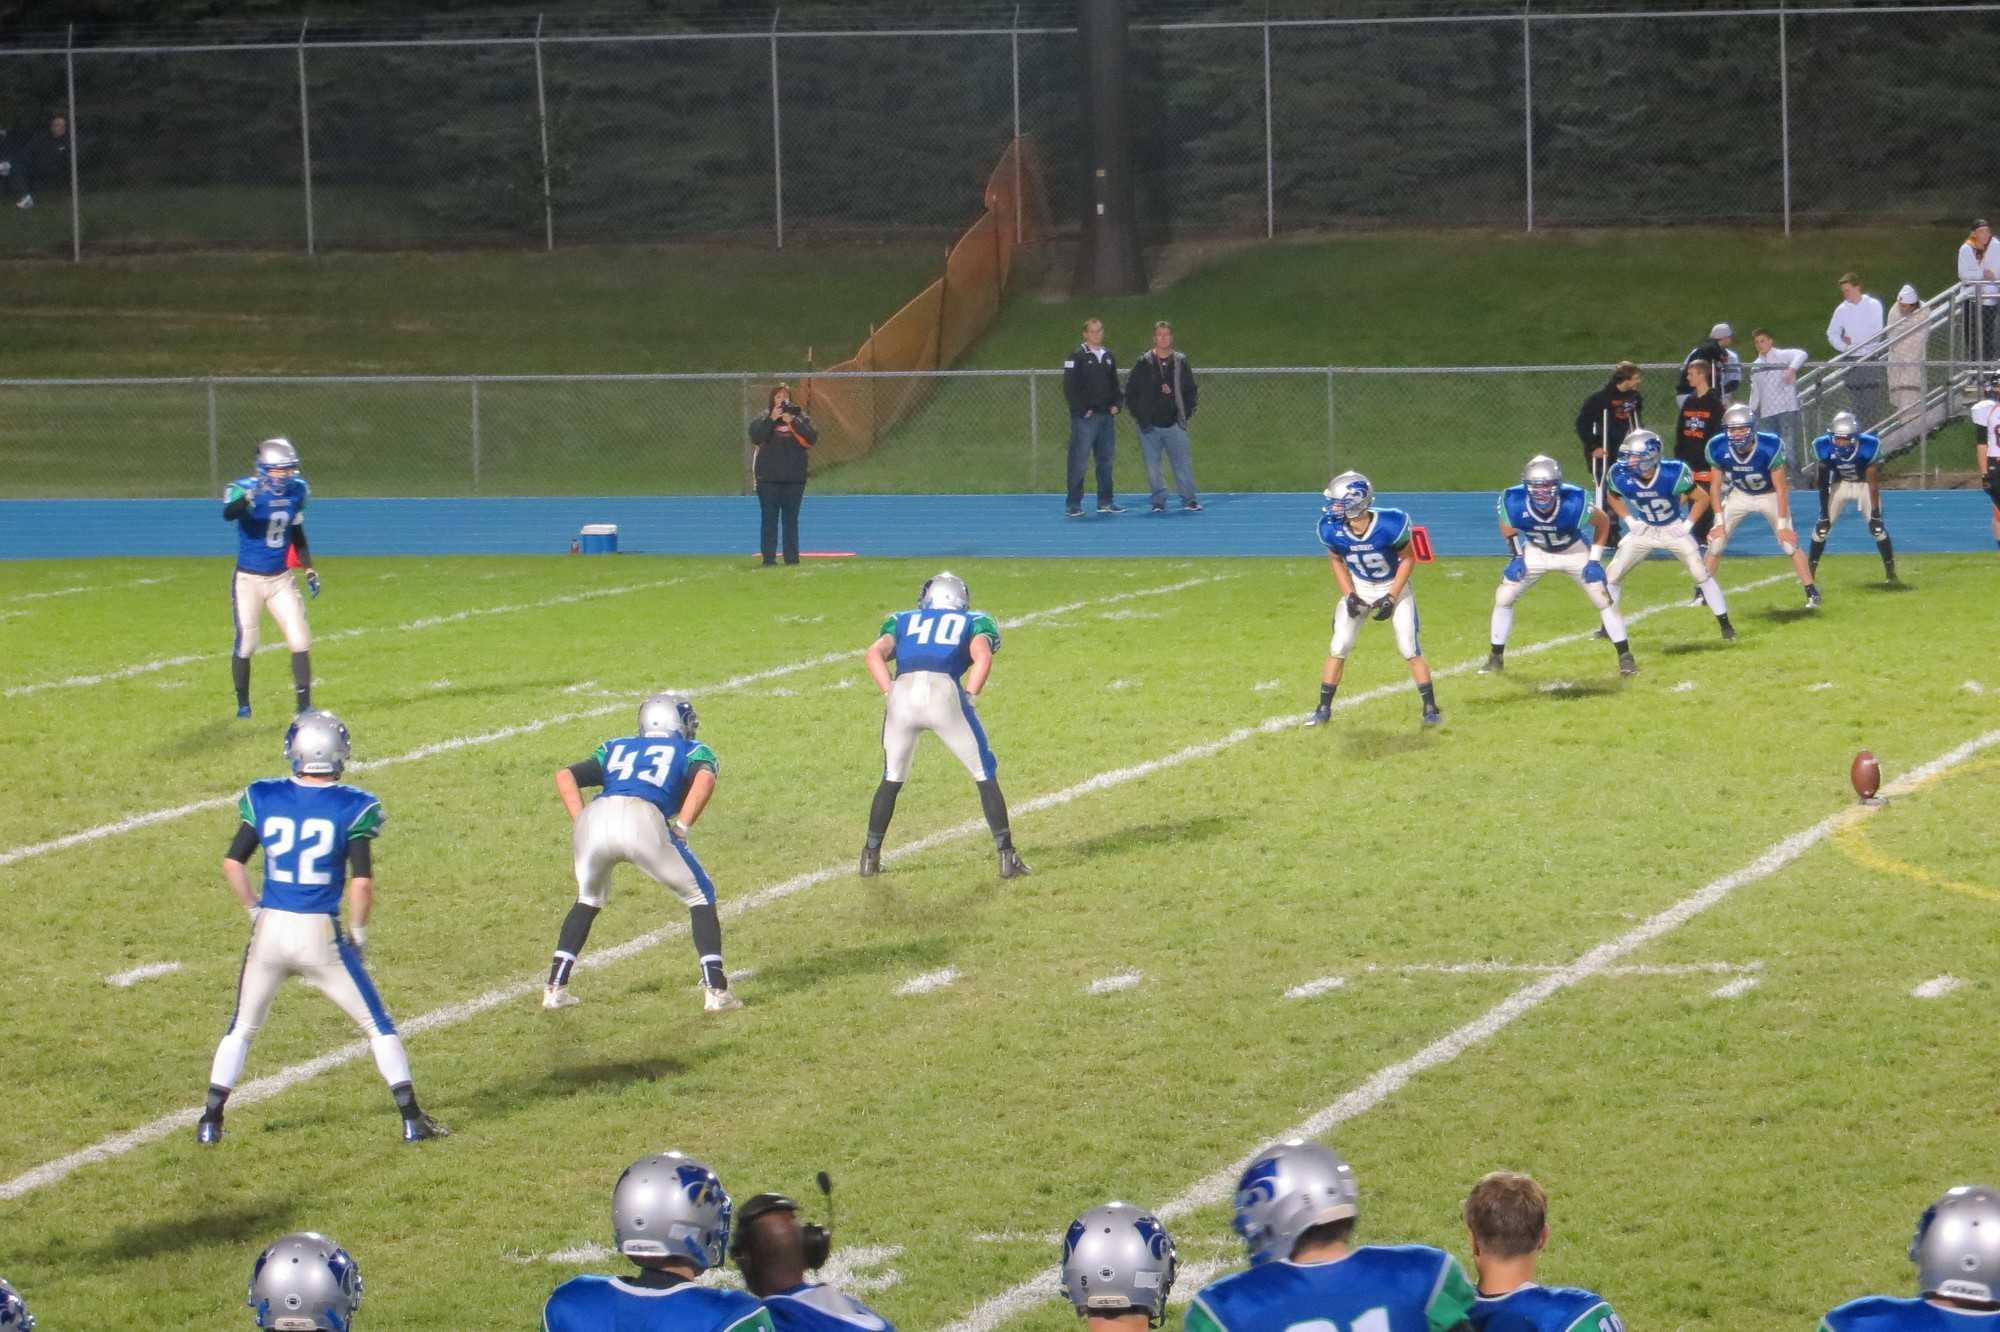 Lincoln Brown preparing his kick